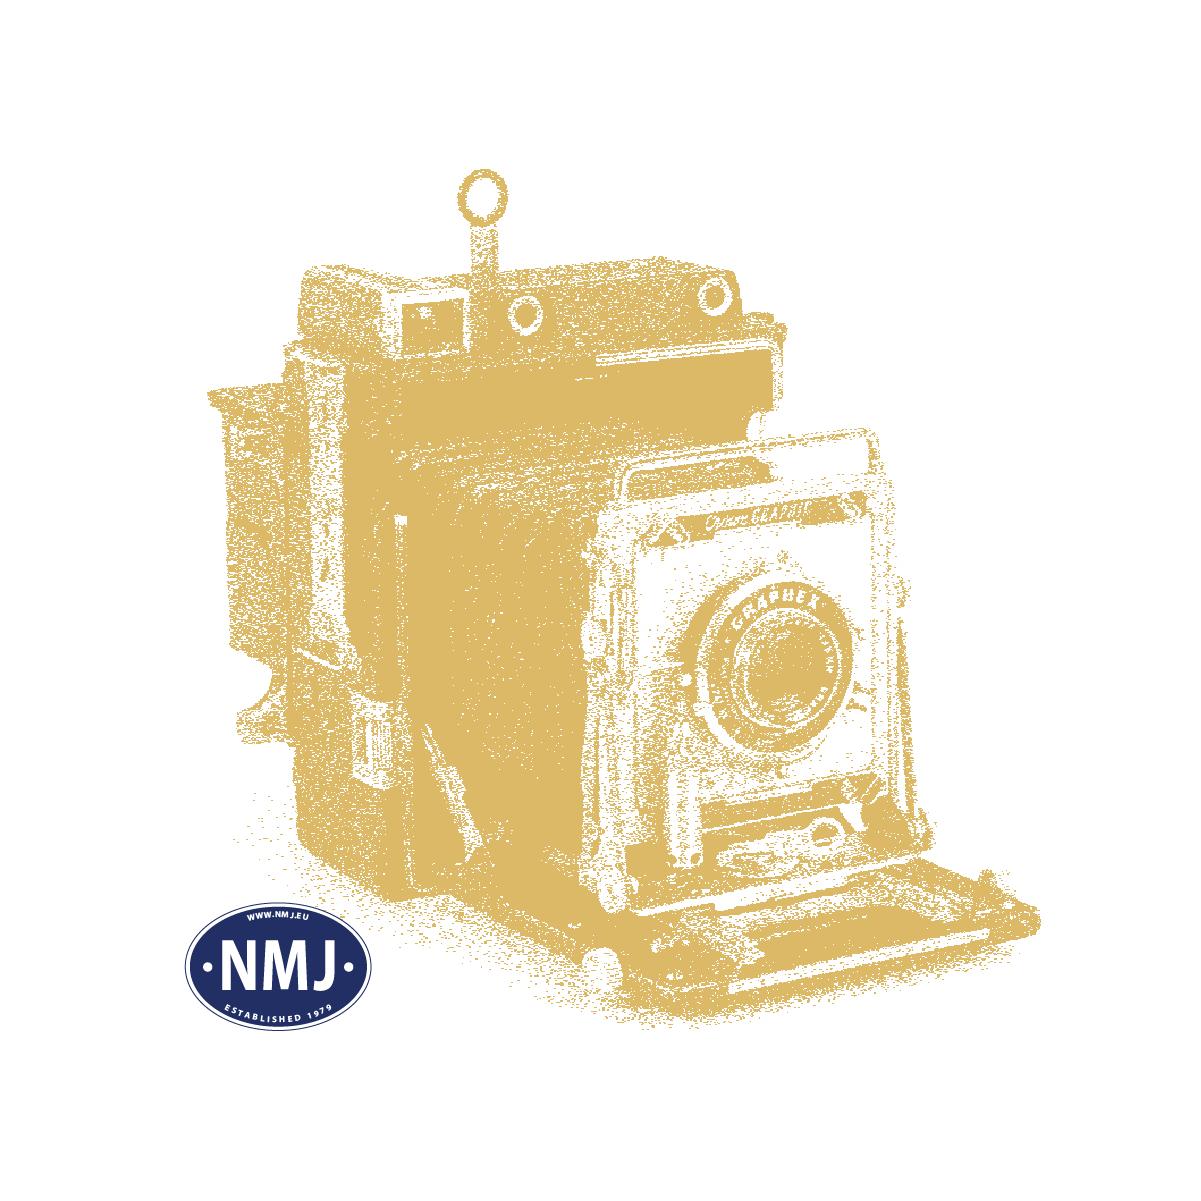 NMJT93002 - NMJ Topline SJ Y1 1275, Orange, DCC m/ Sound